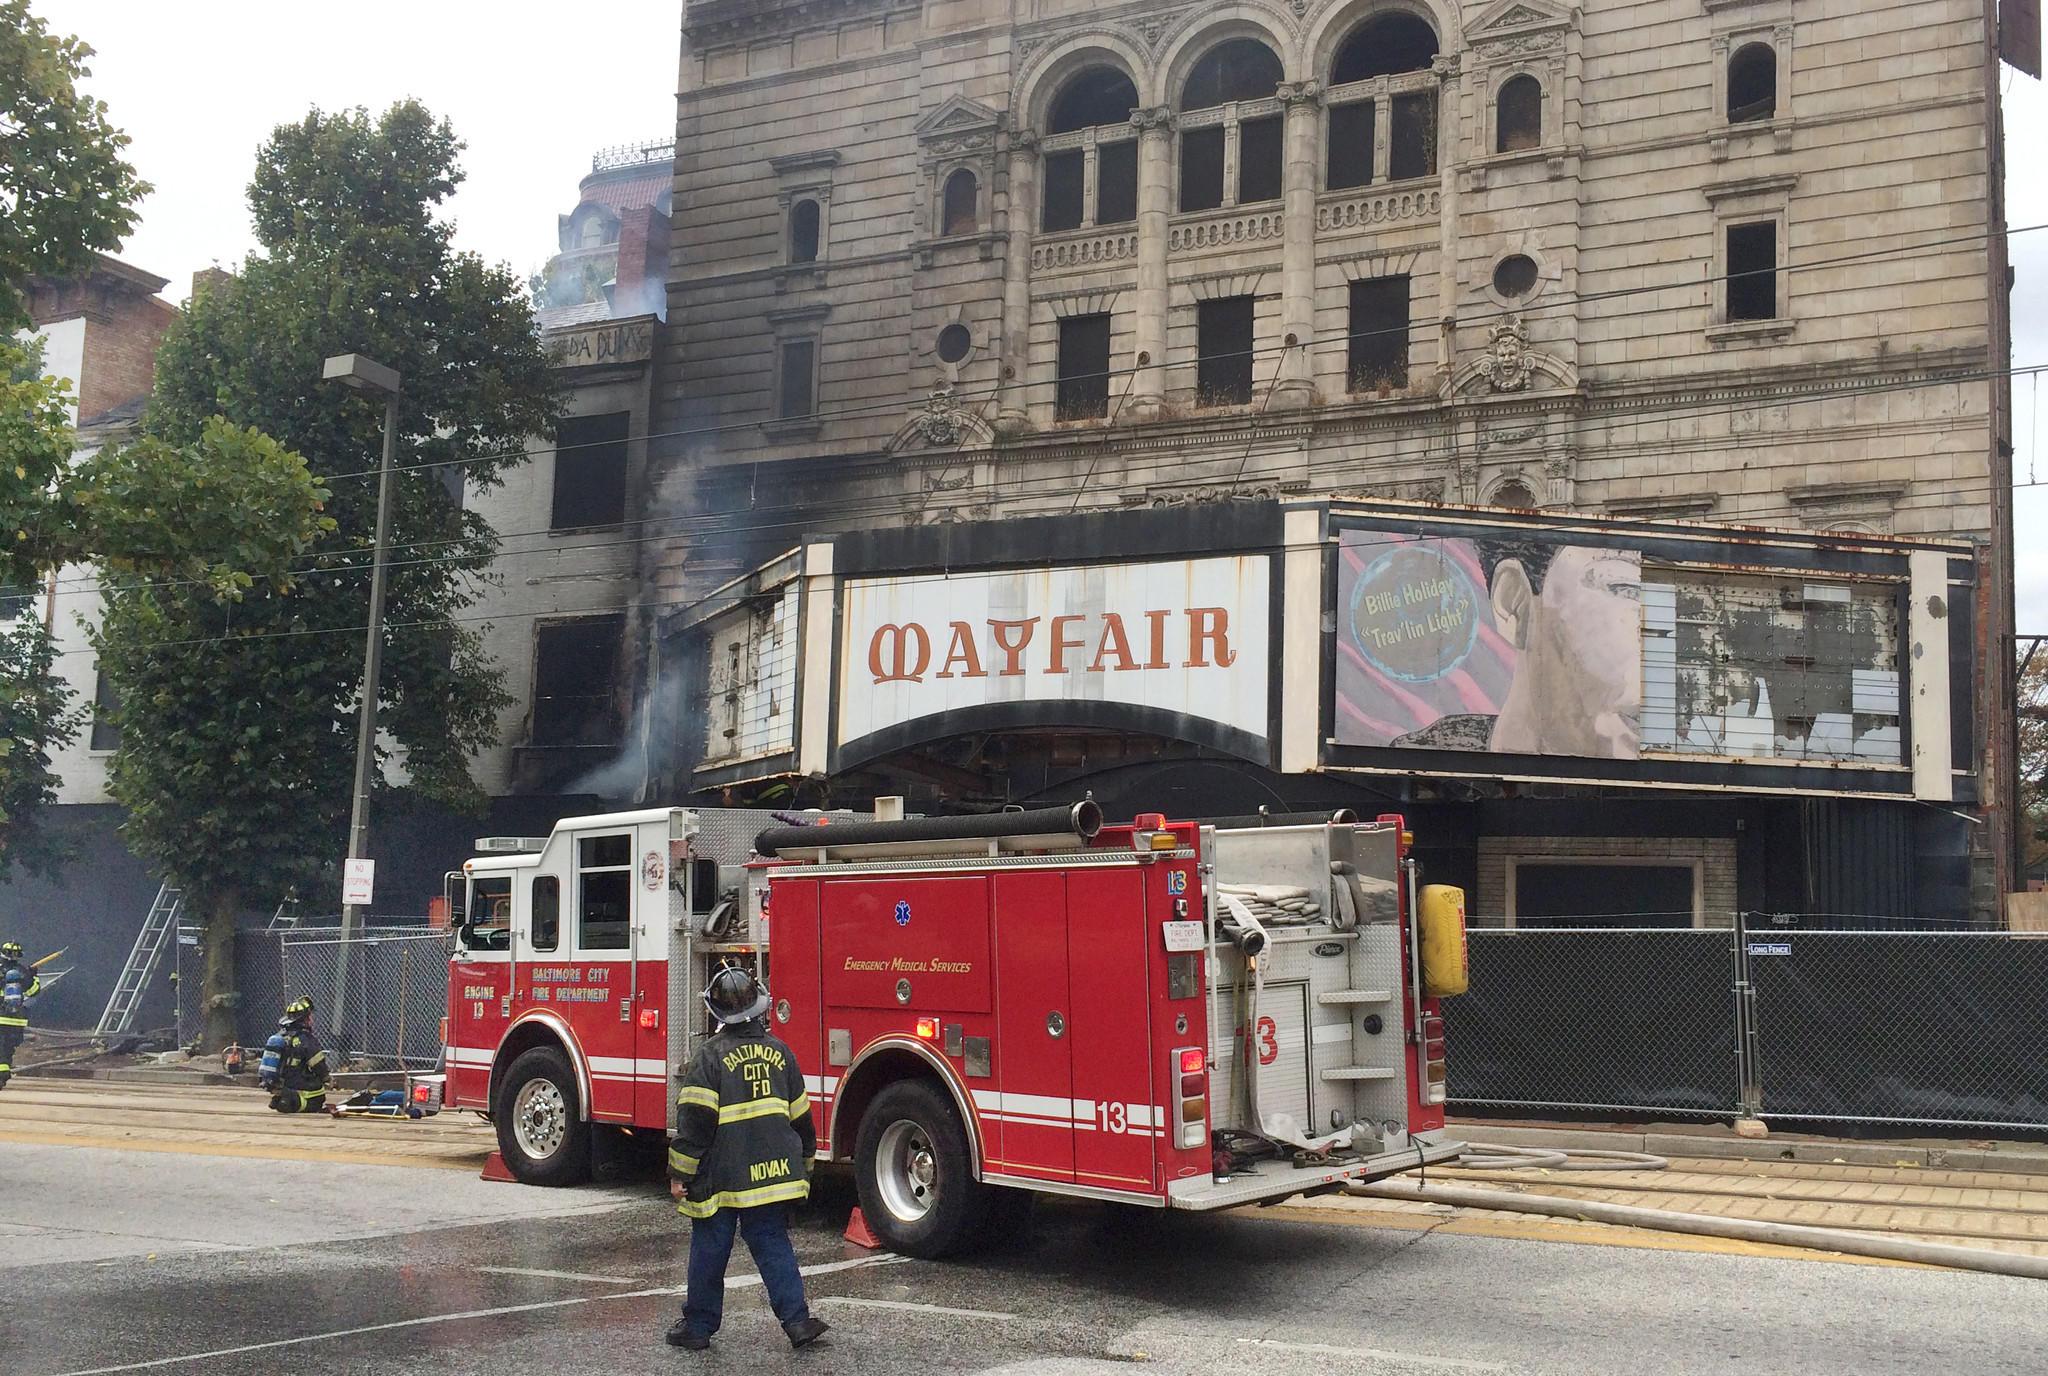 Two-alarm blaze near Mayfair Theatre halts light rail ...